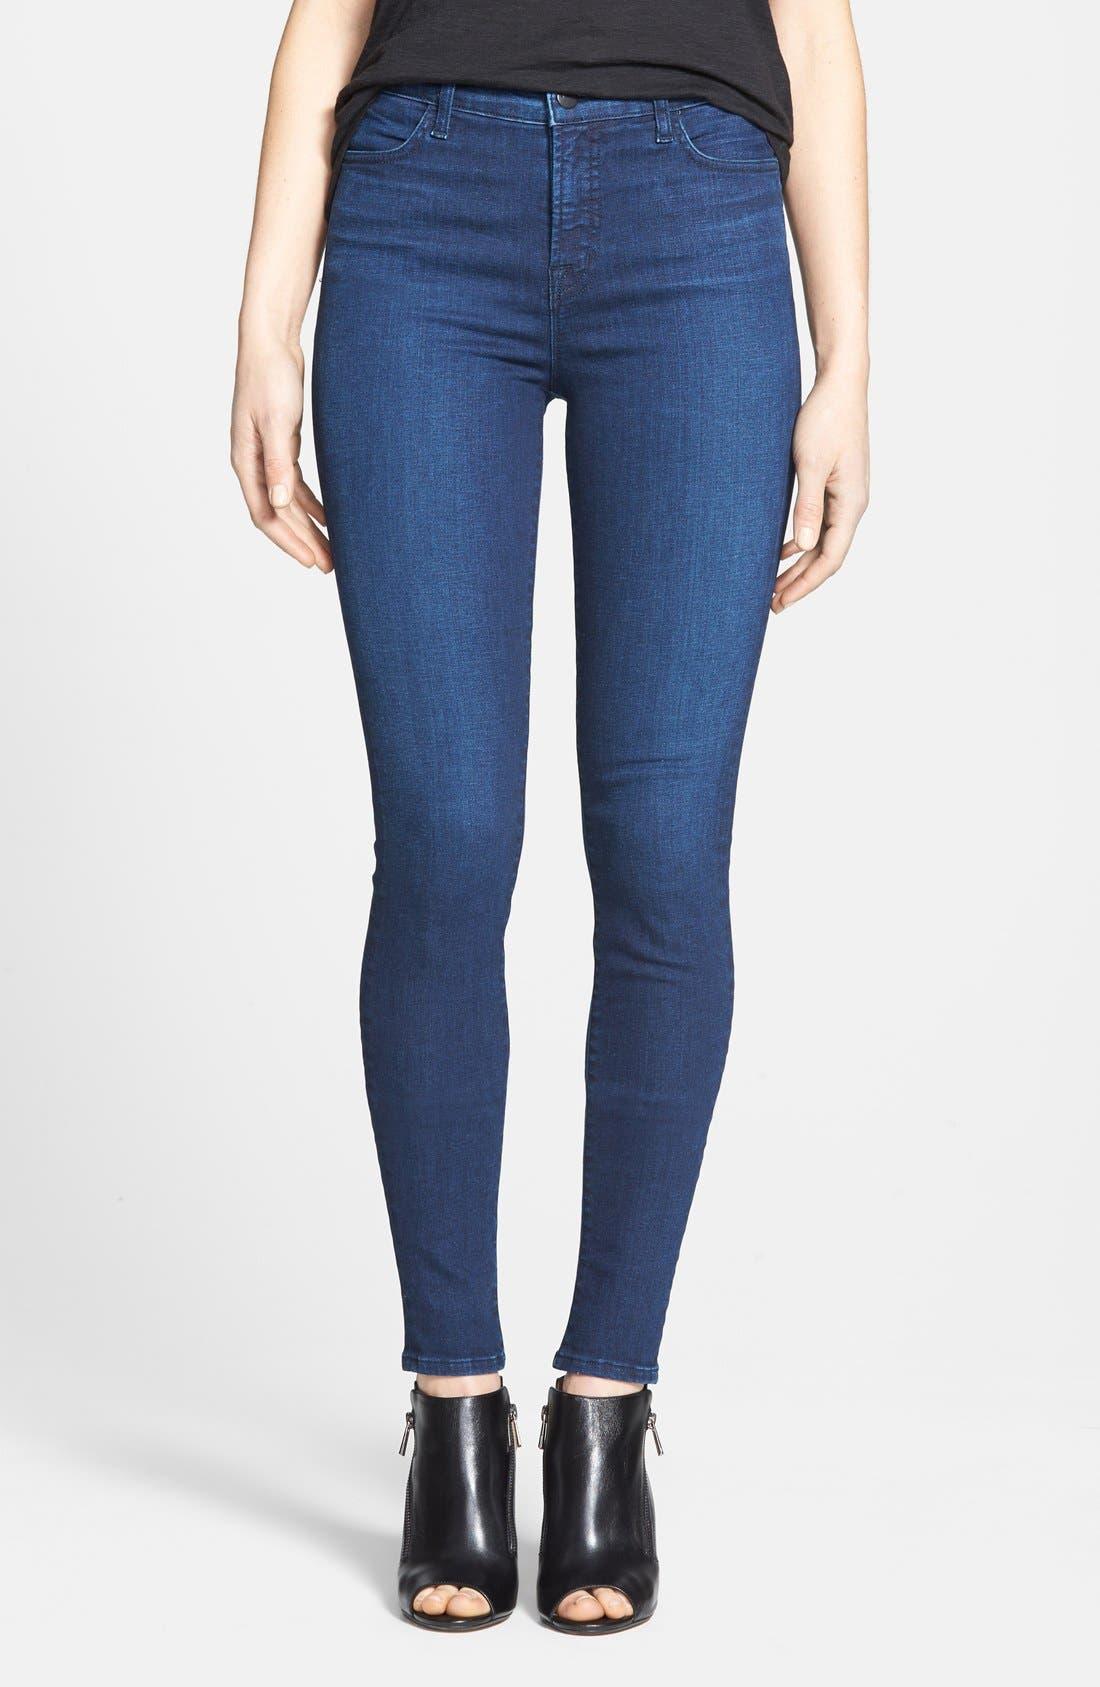 J BRAND,                             'Maria' High Rise Skinny Jeans,                             Main thumbnail 1, color,                             400